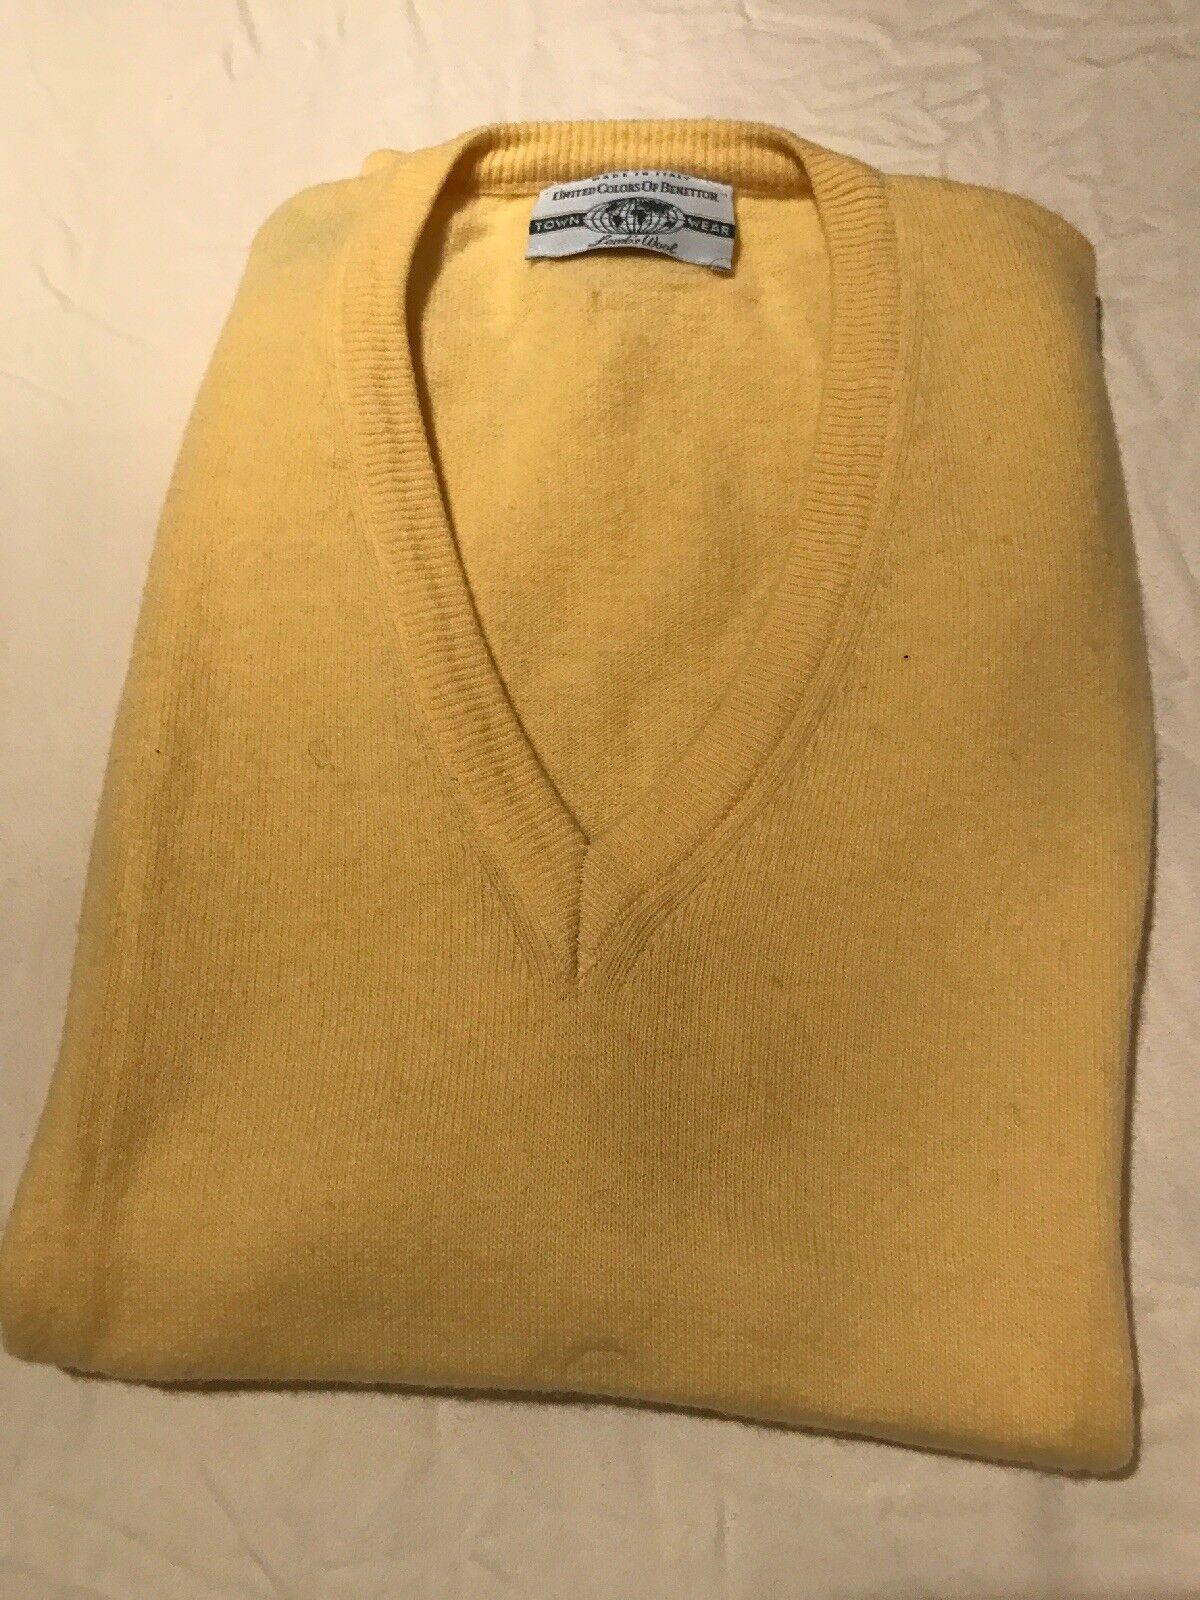 Men's M Größe 48 Benetton Vest Sweater Was 135 Made In  Lamb's Wool NWOT